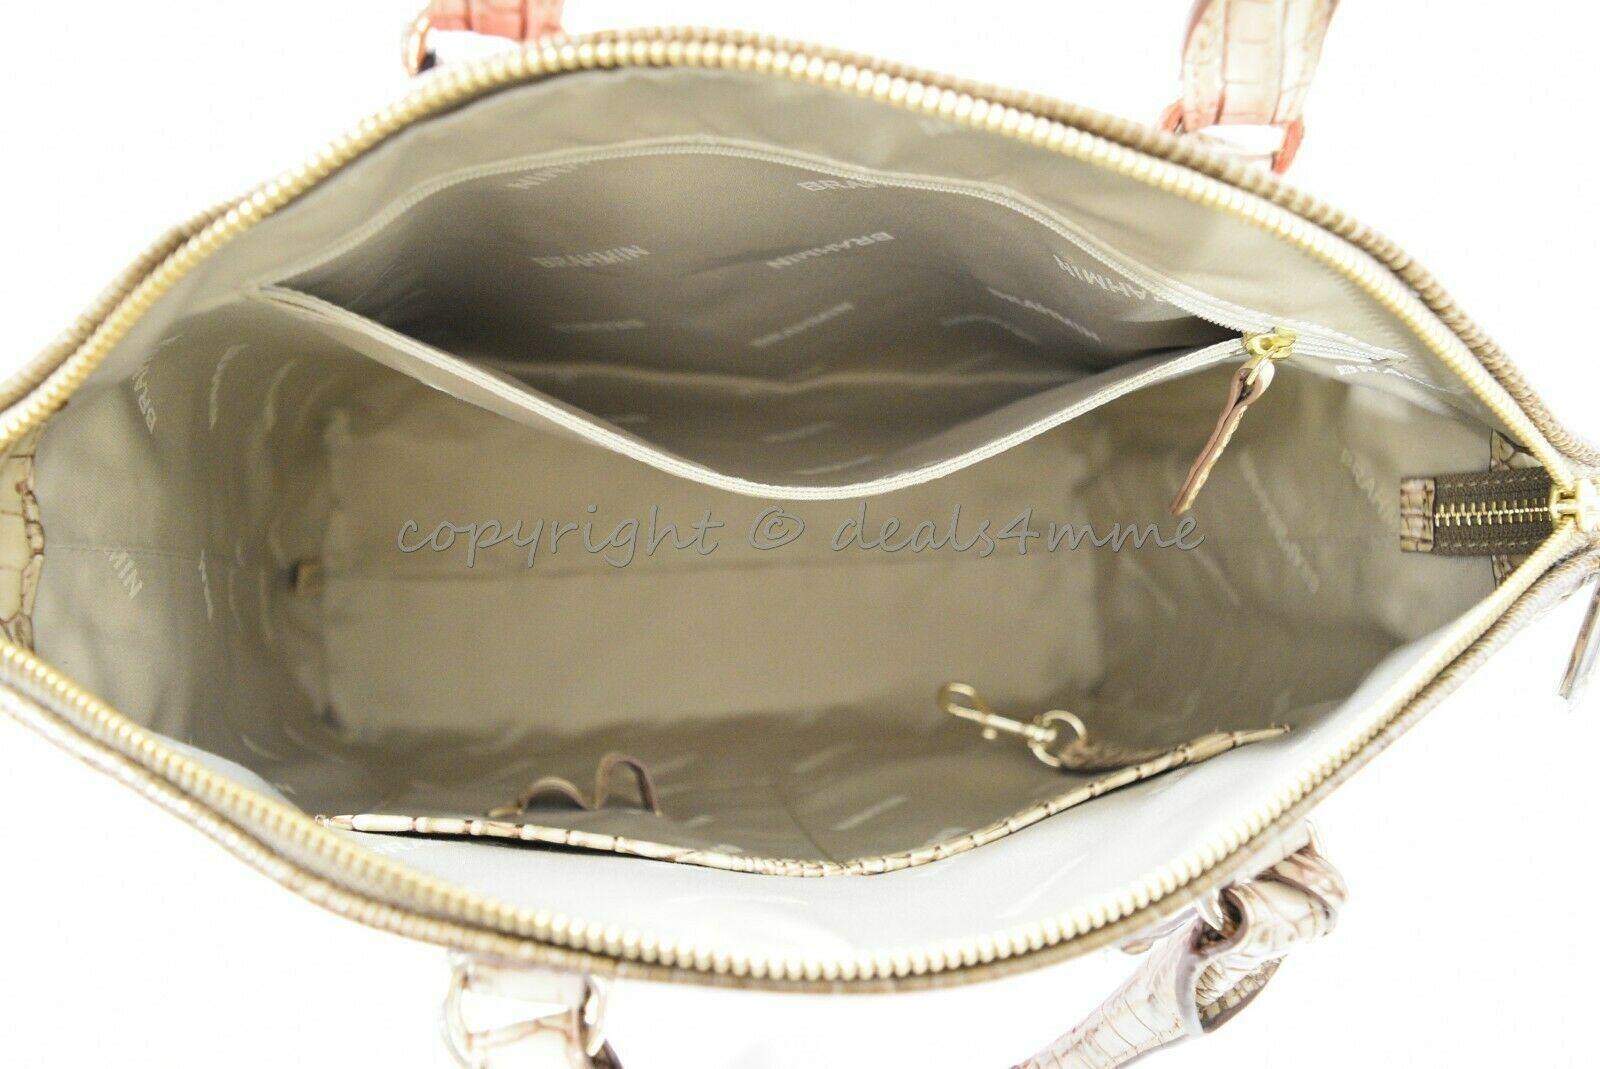 NWT Brahmin Large Duxbury Satchel/Shoulder Bag in Candy Apple Carlisle image 3